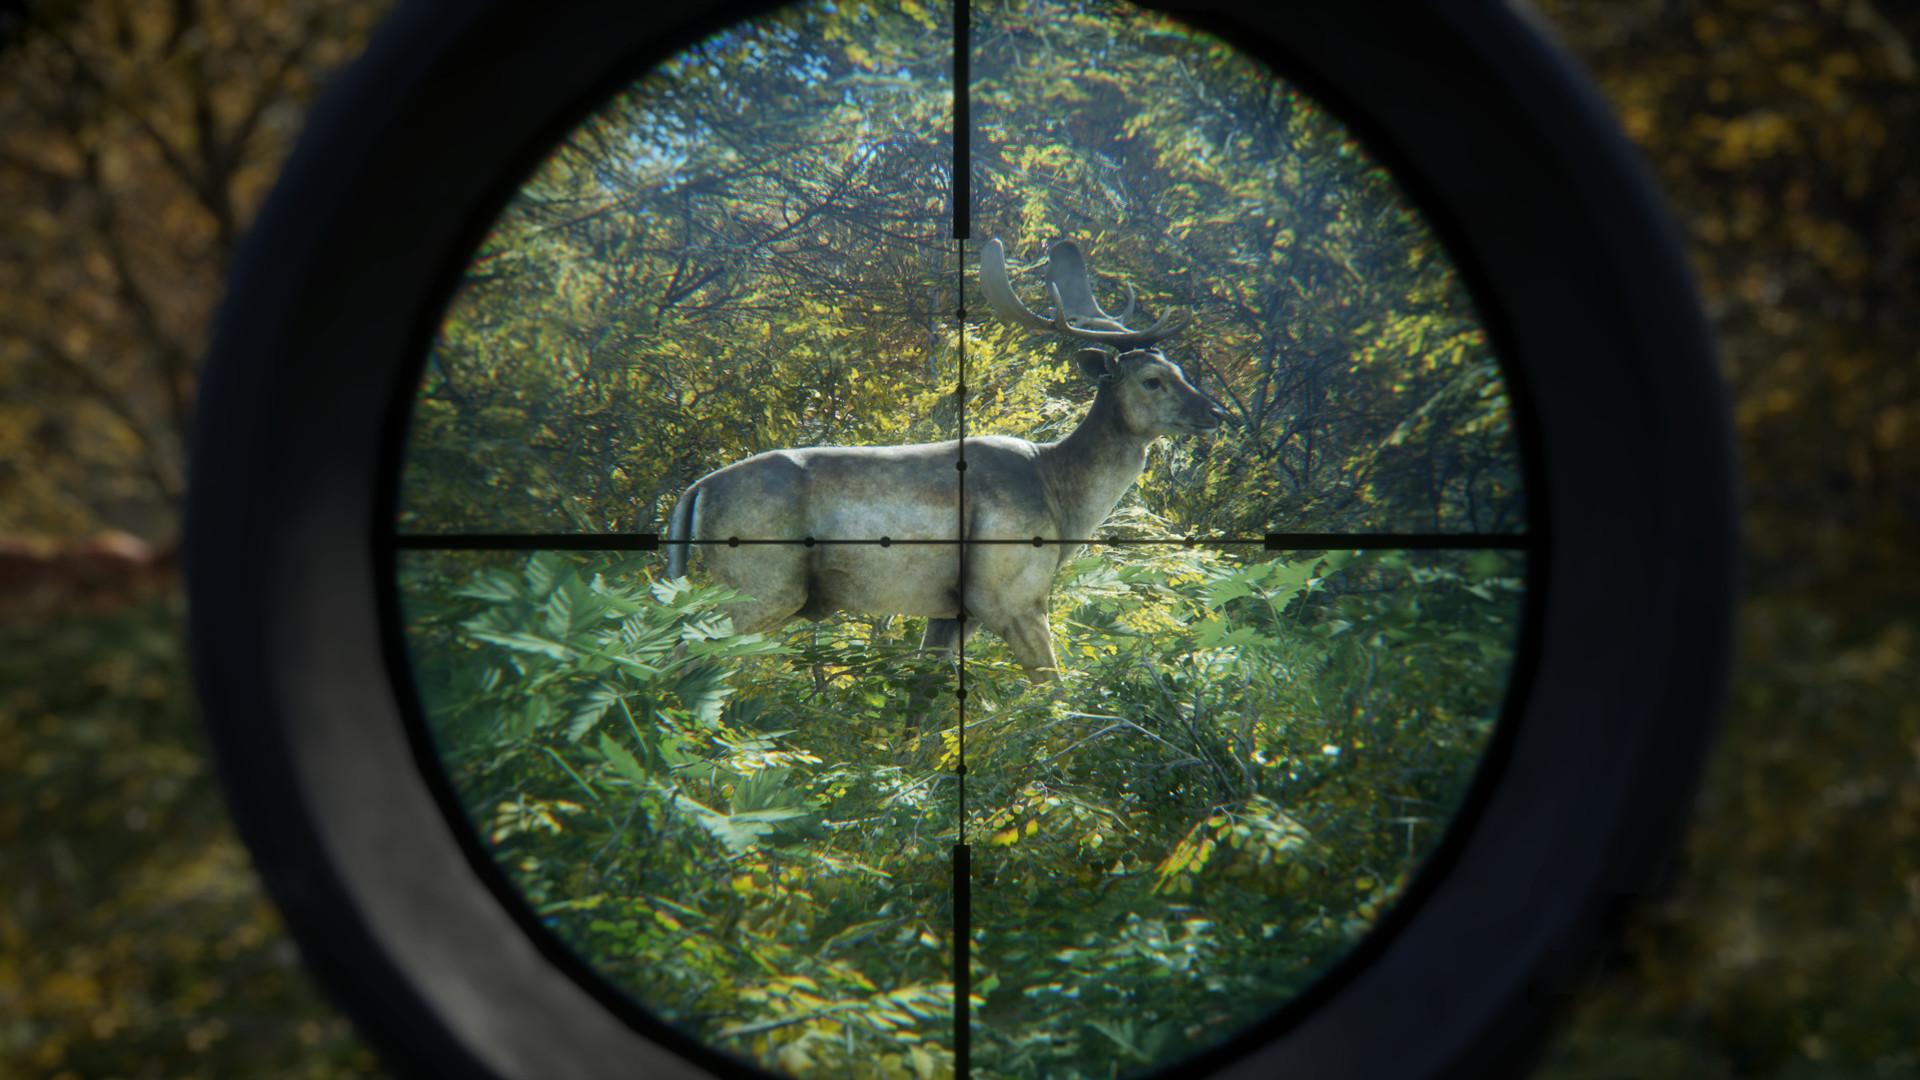 theHunter: Call of wild